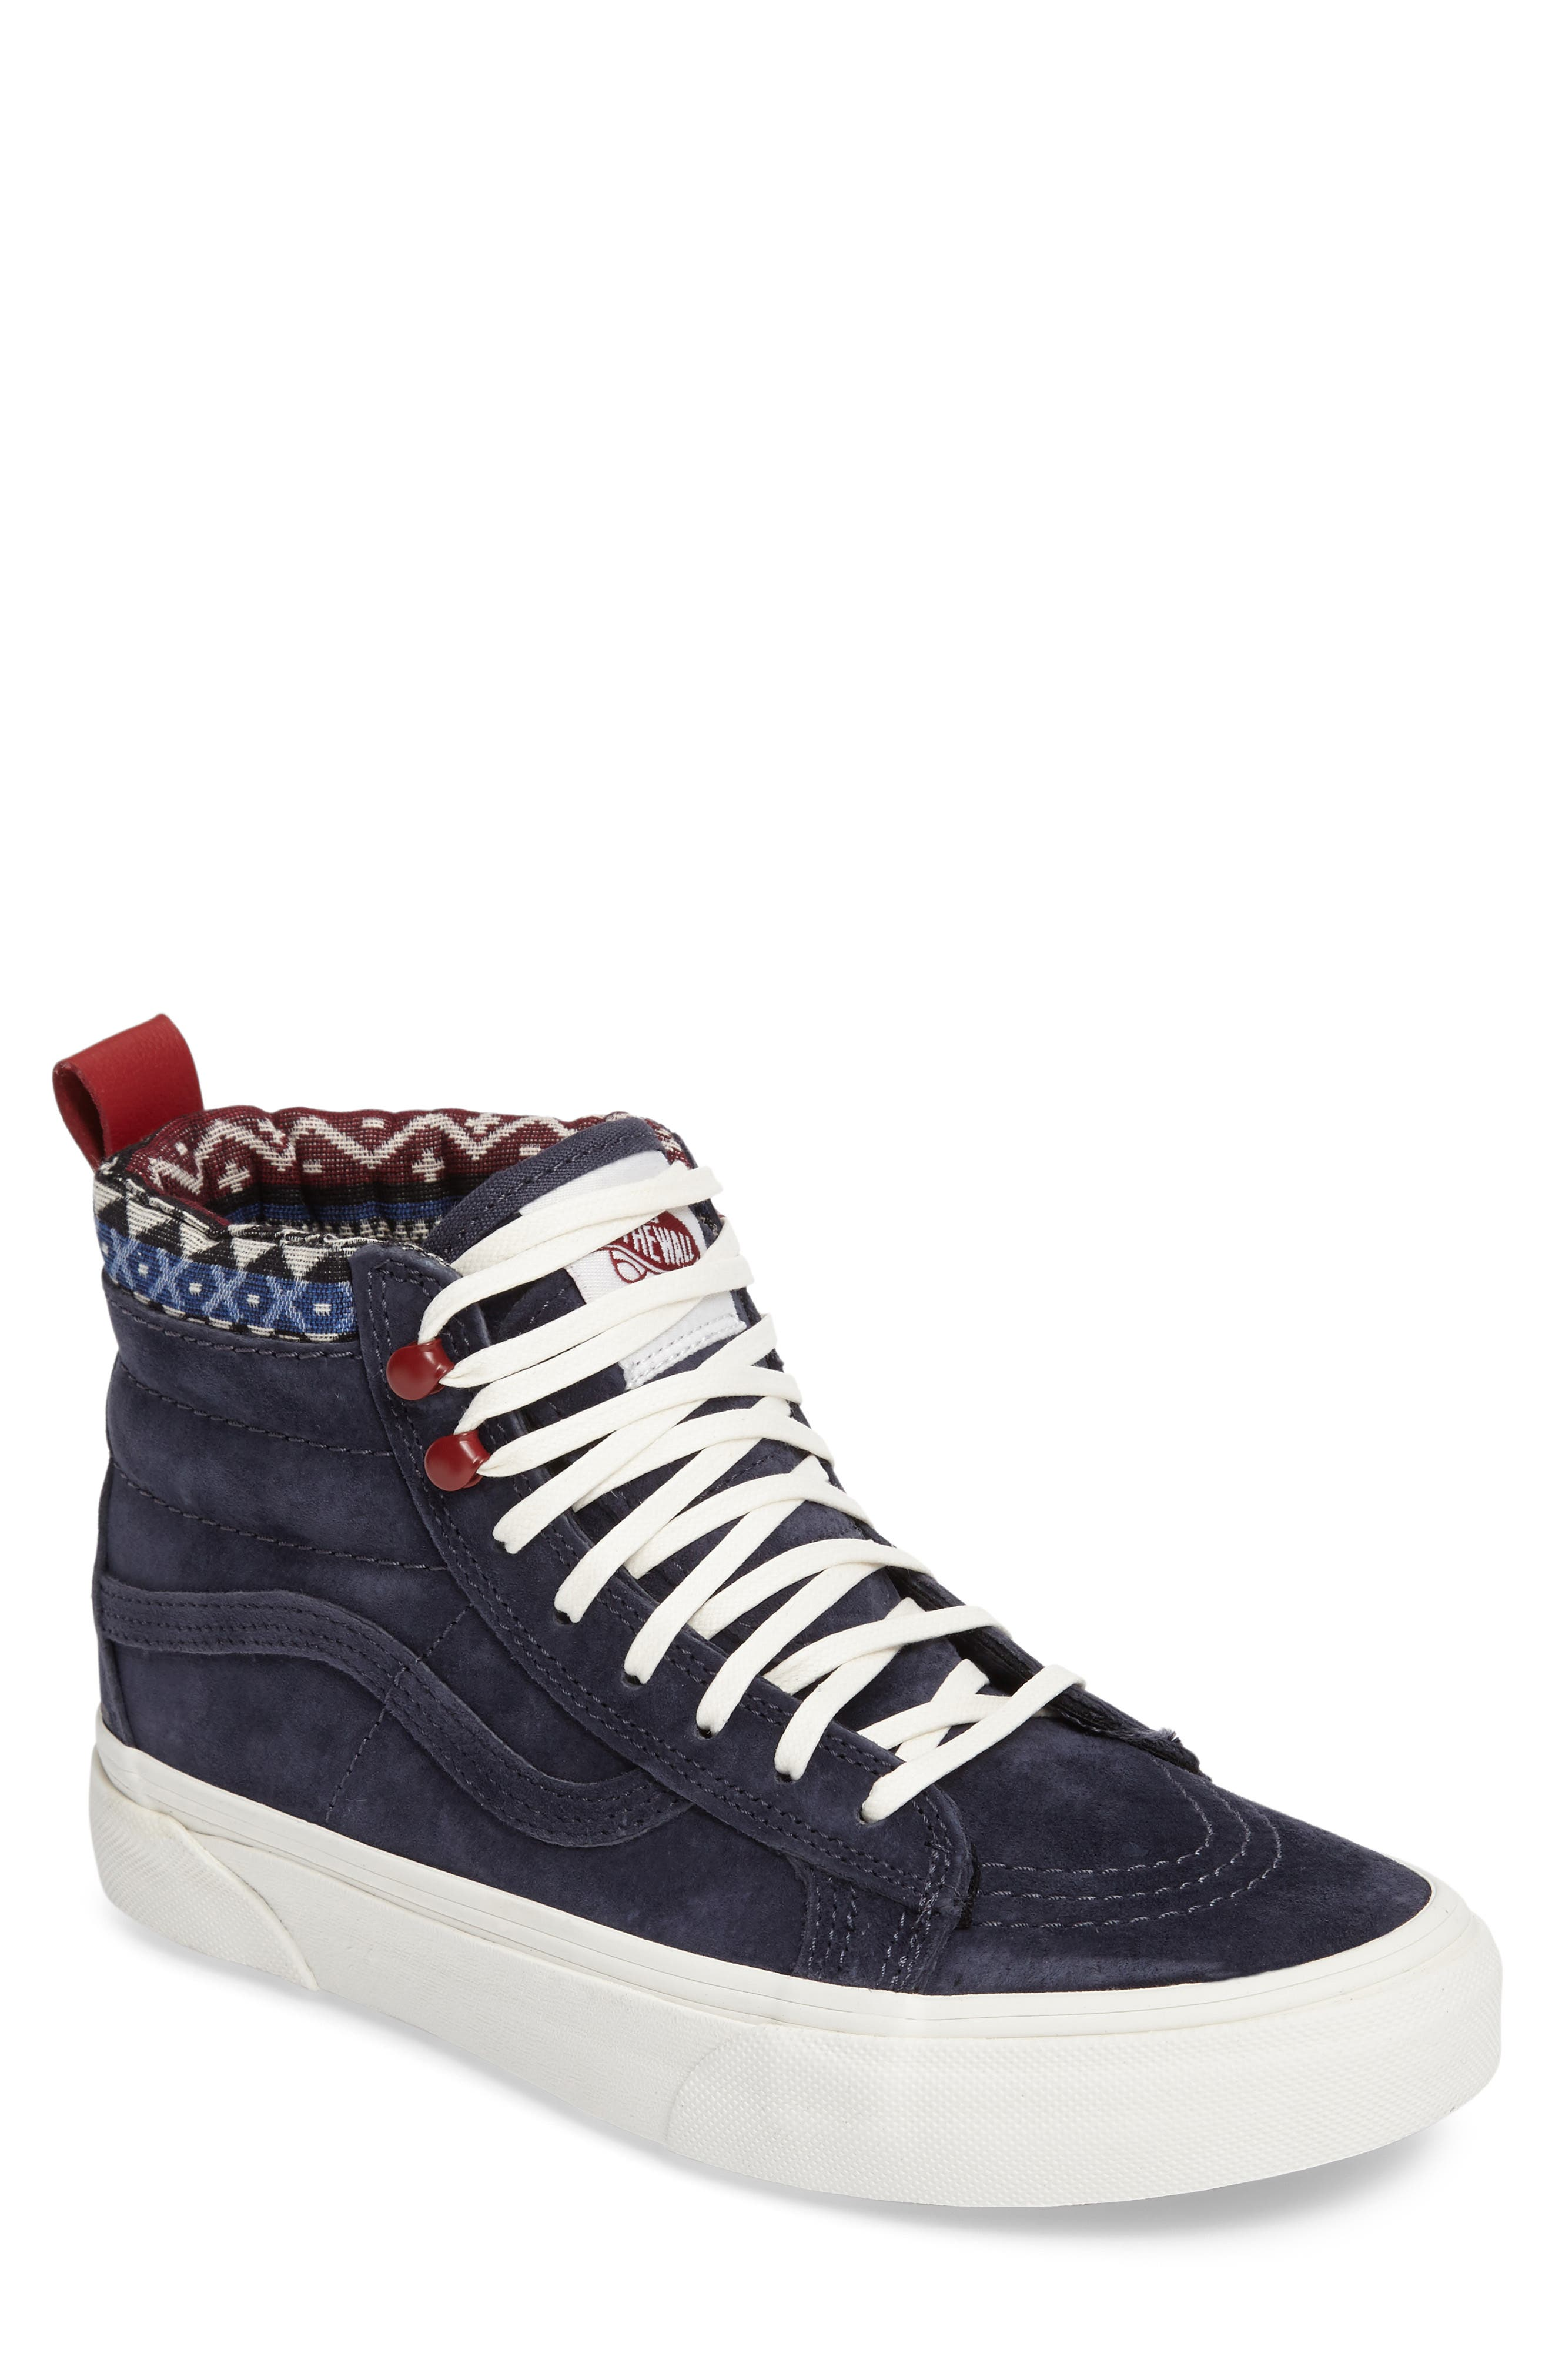 Sk-8 Hi MTE Sneaker,                         Main,                         color, Parisian Night/ Blue Suede